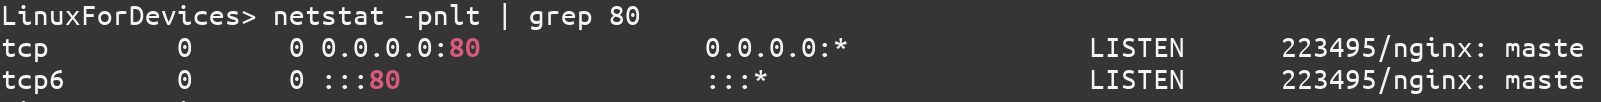 Nginx Server Check